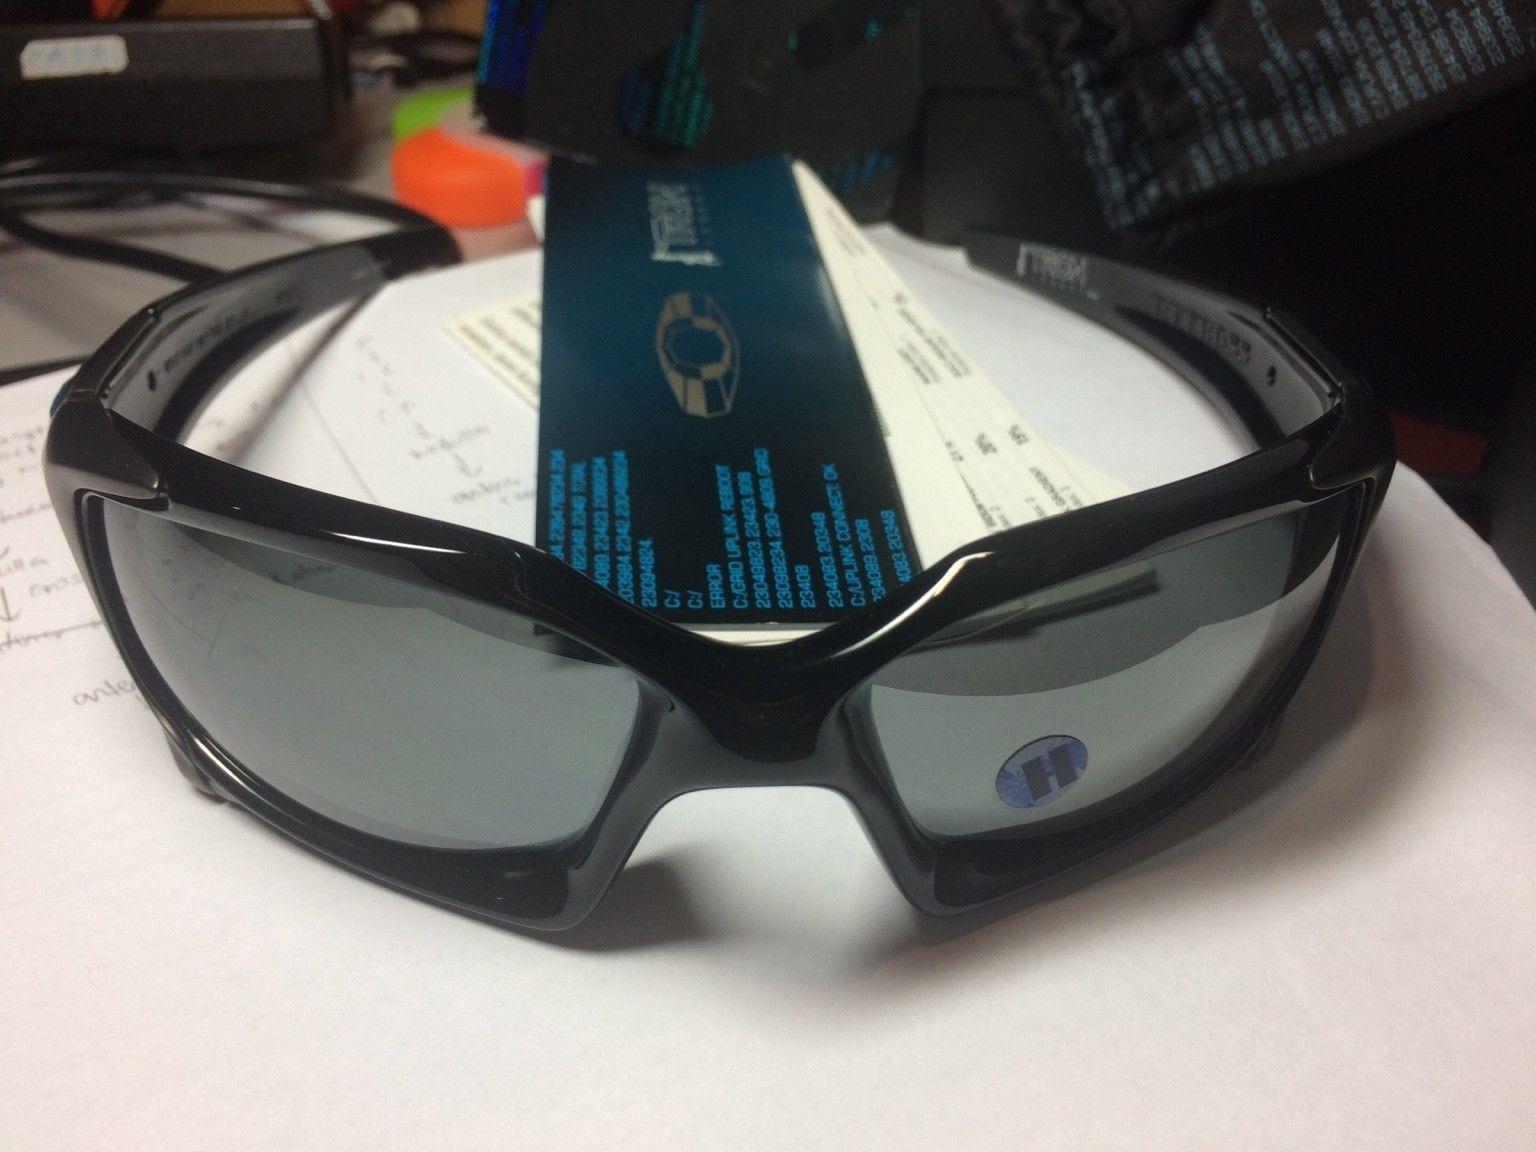 Oakley Tron Pitboss - a7862a77b30832d0a850c0faf7c97f40.jpg